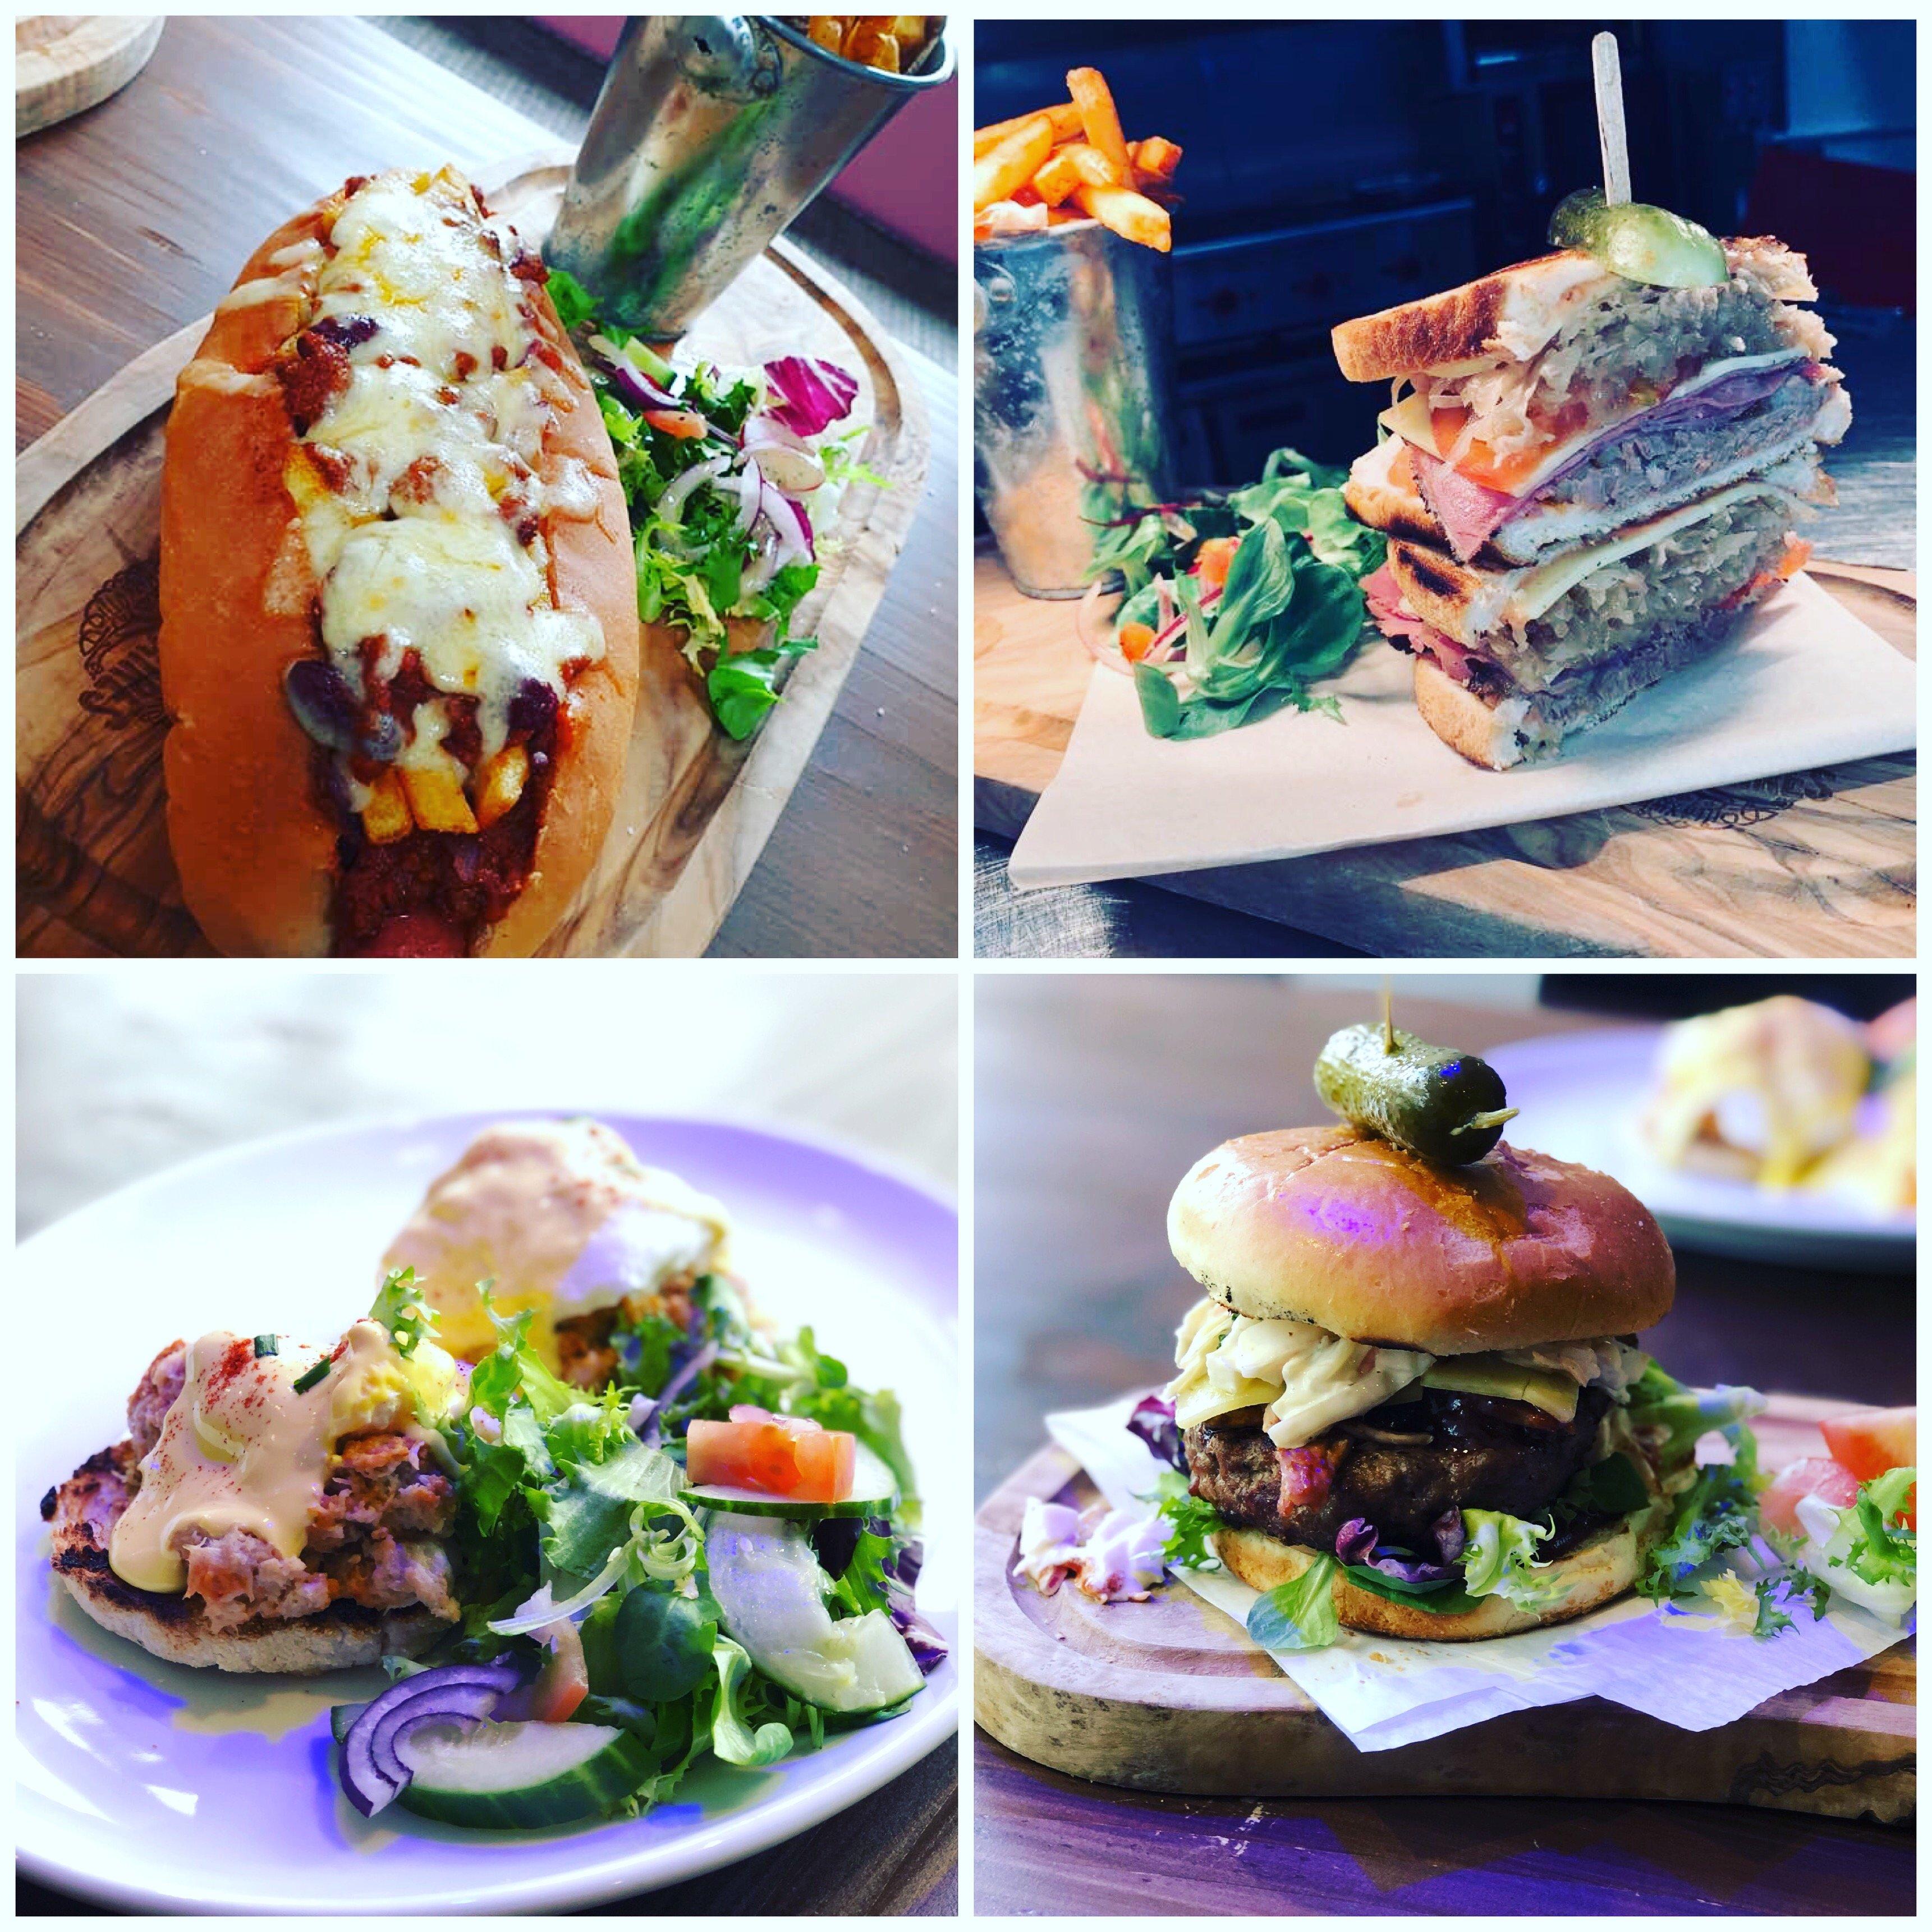 Most Popular Steakhouse food in Kettering, England, United Kingdom